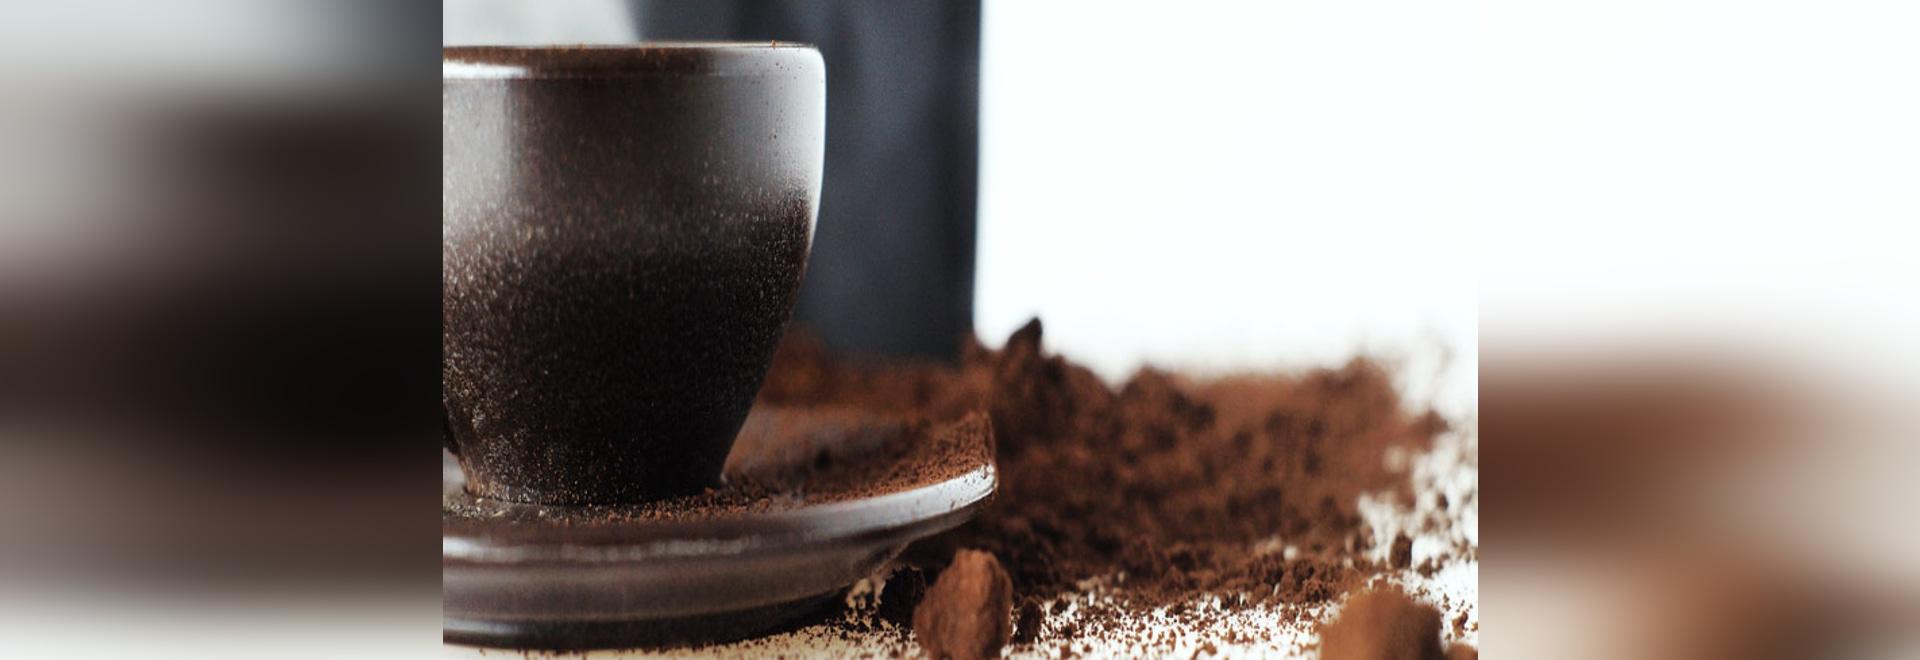 Courtoisie de forme de Kaffee